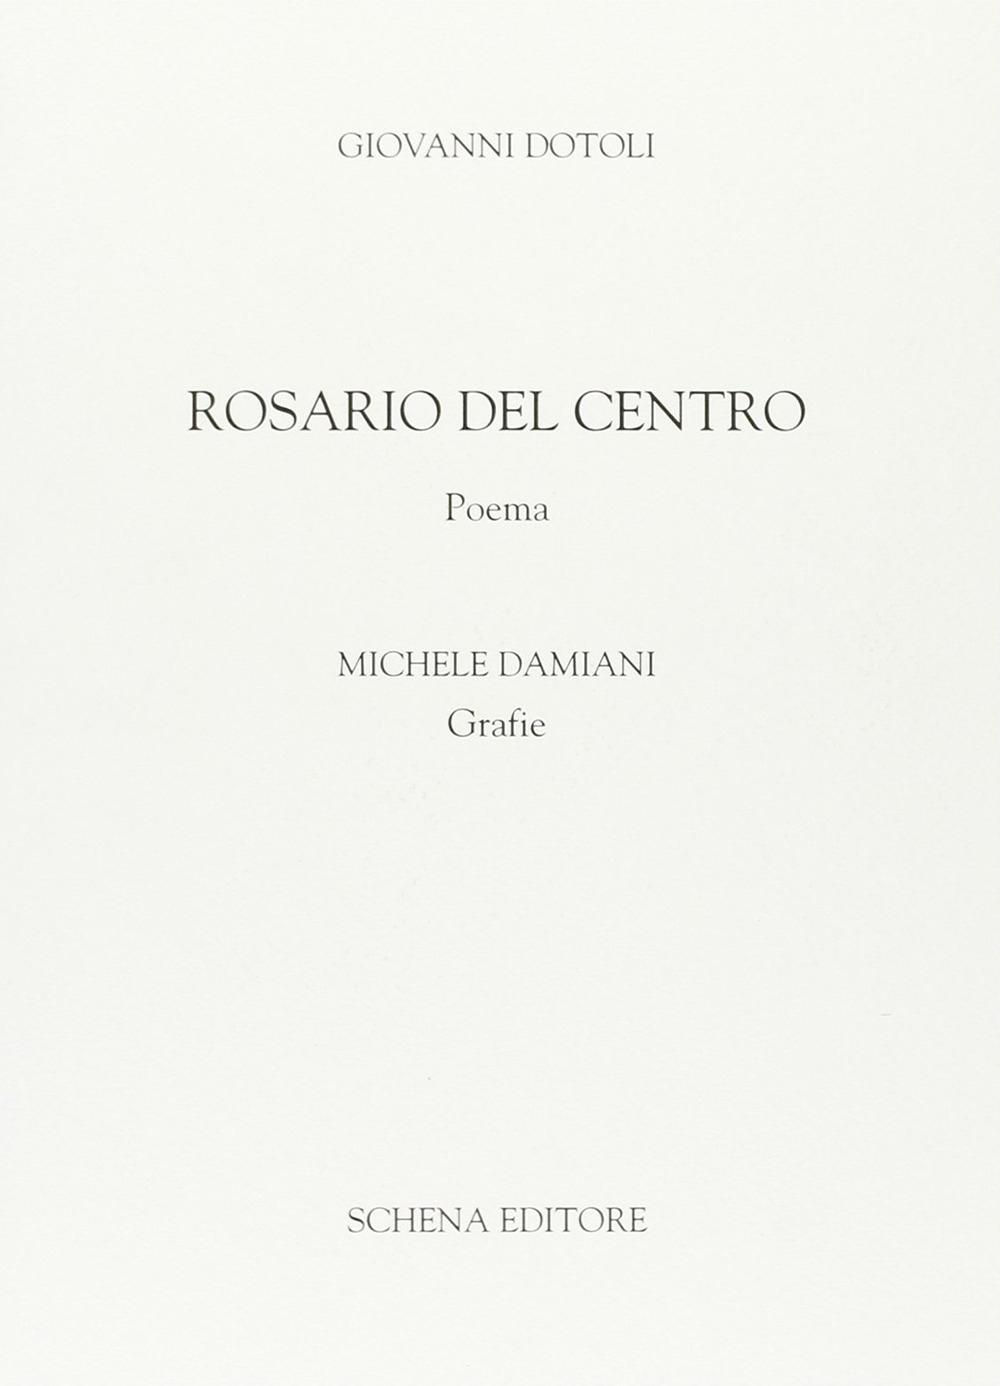 Rosario del Centro. Poema.